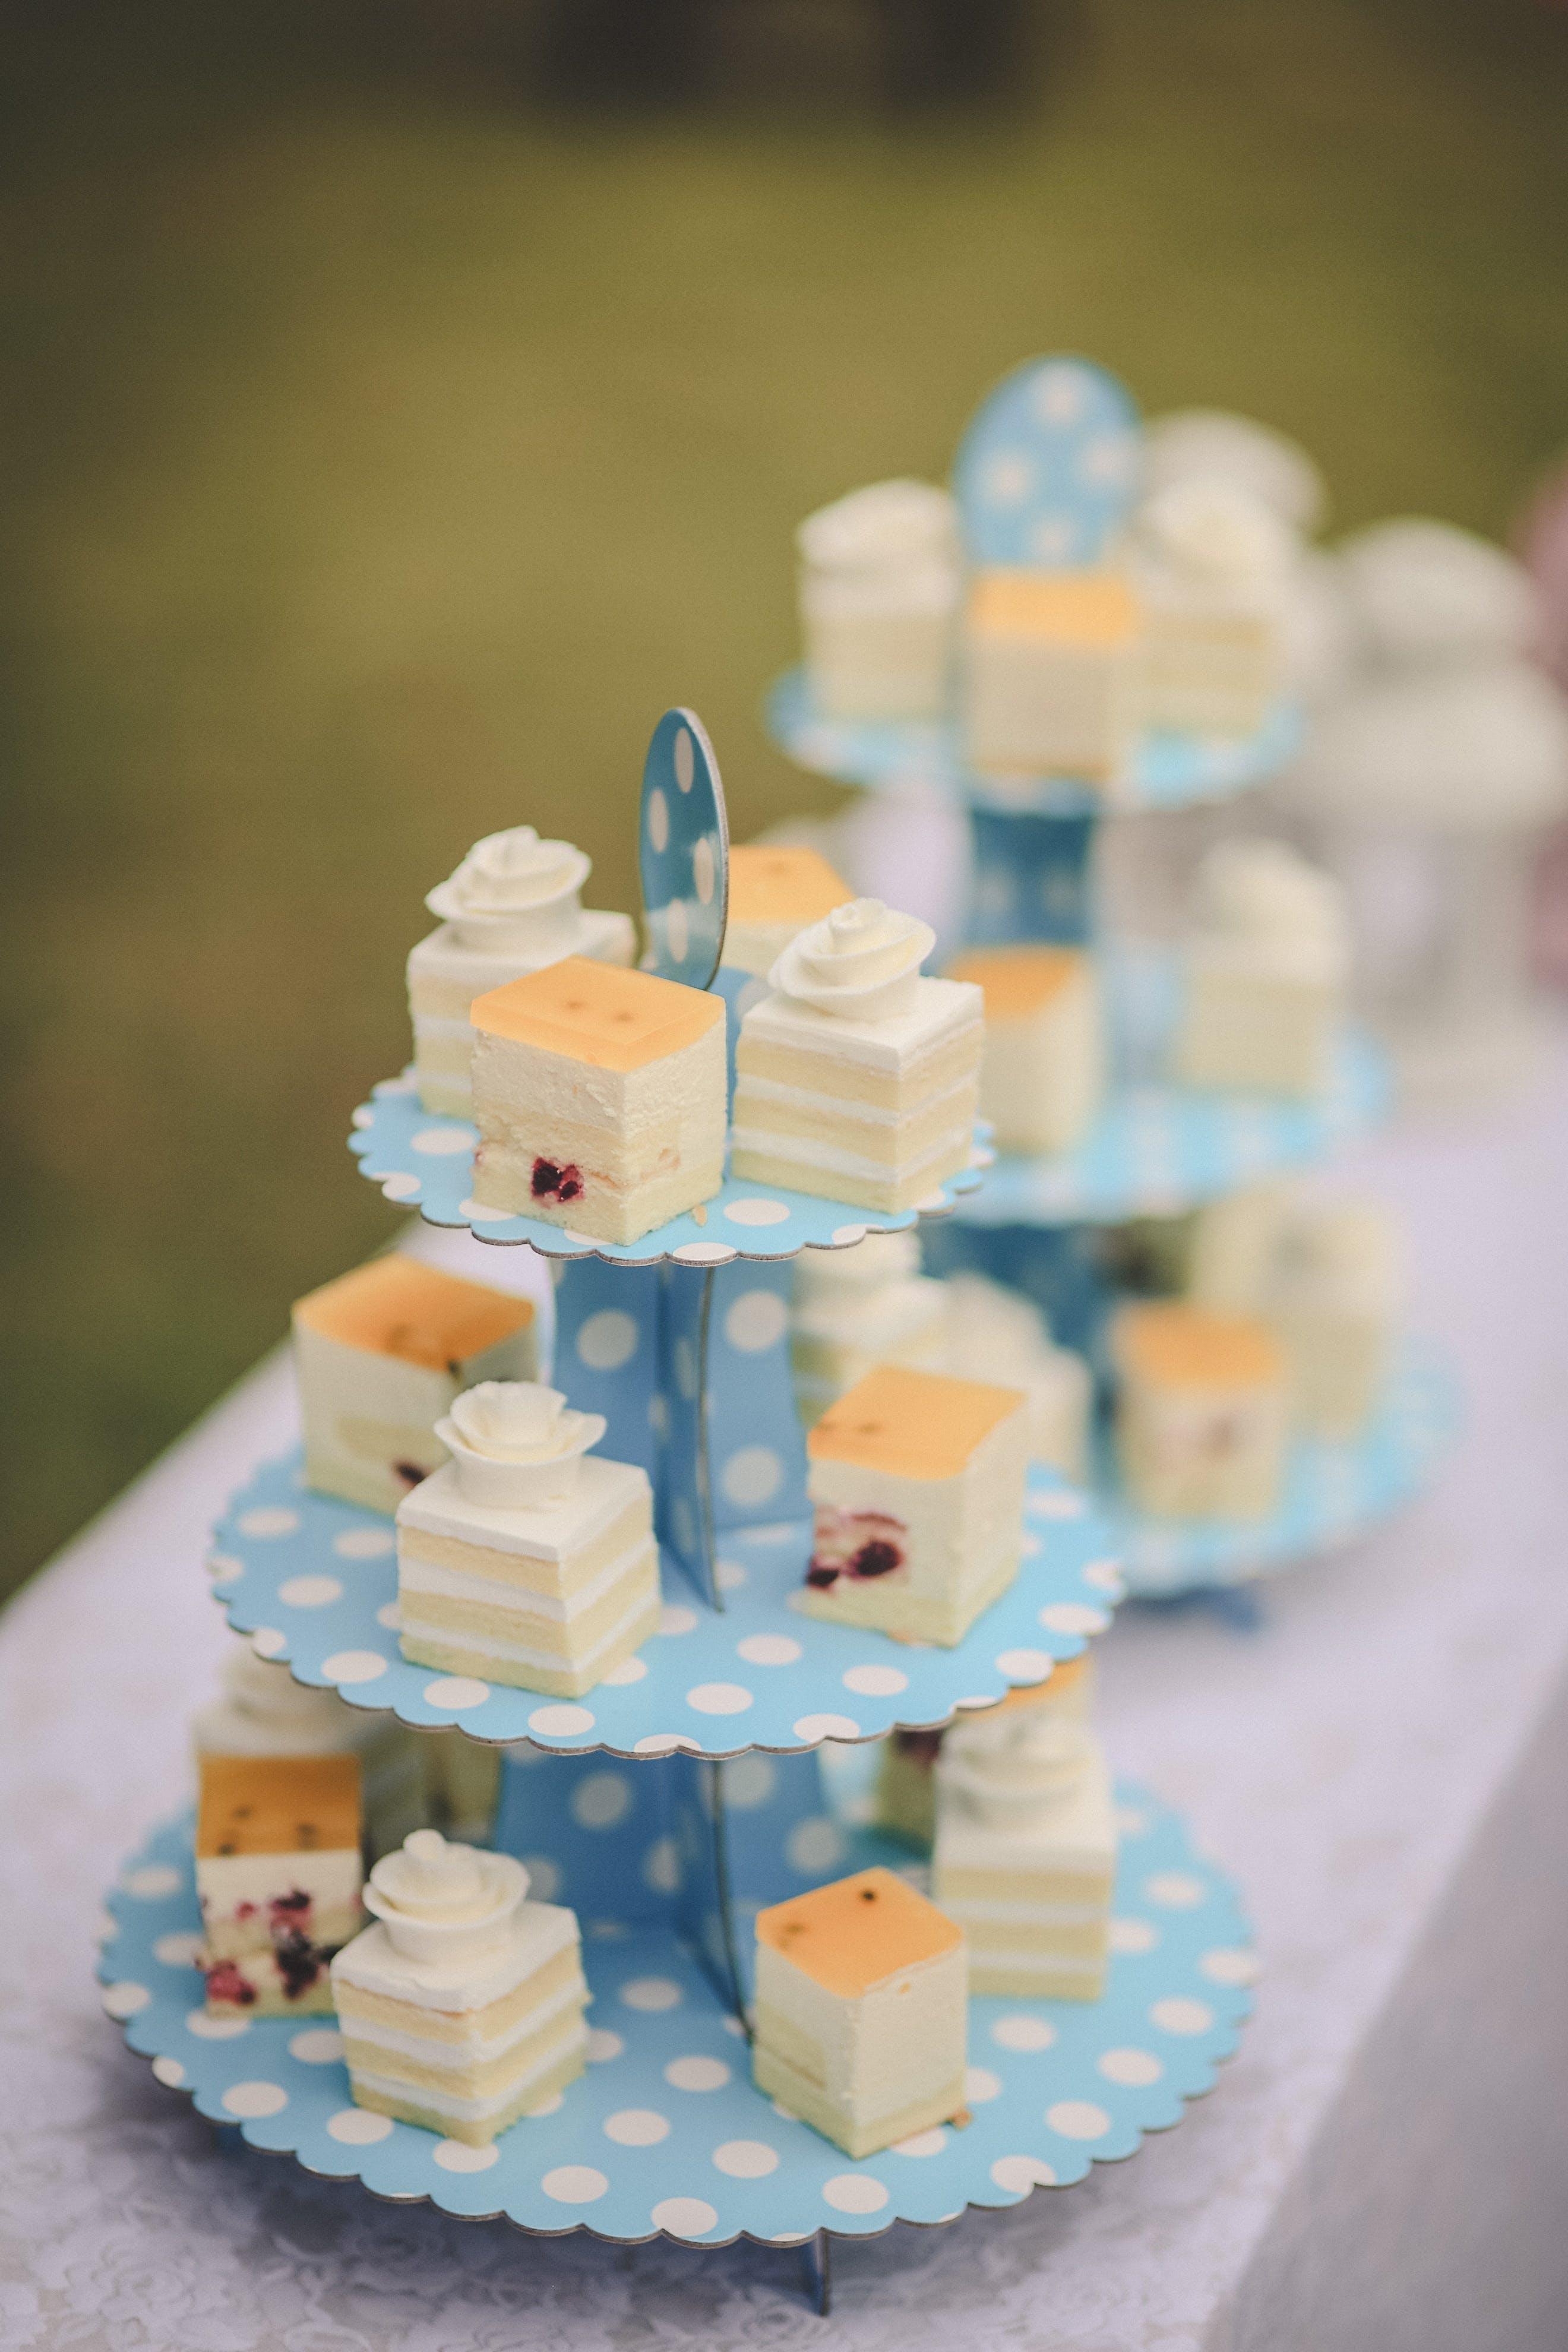 Two Blue Cupcake Racks